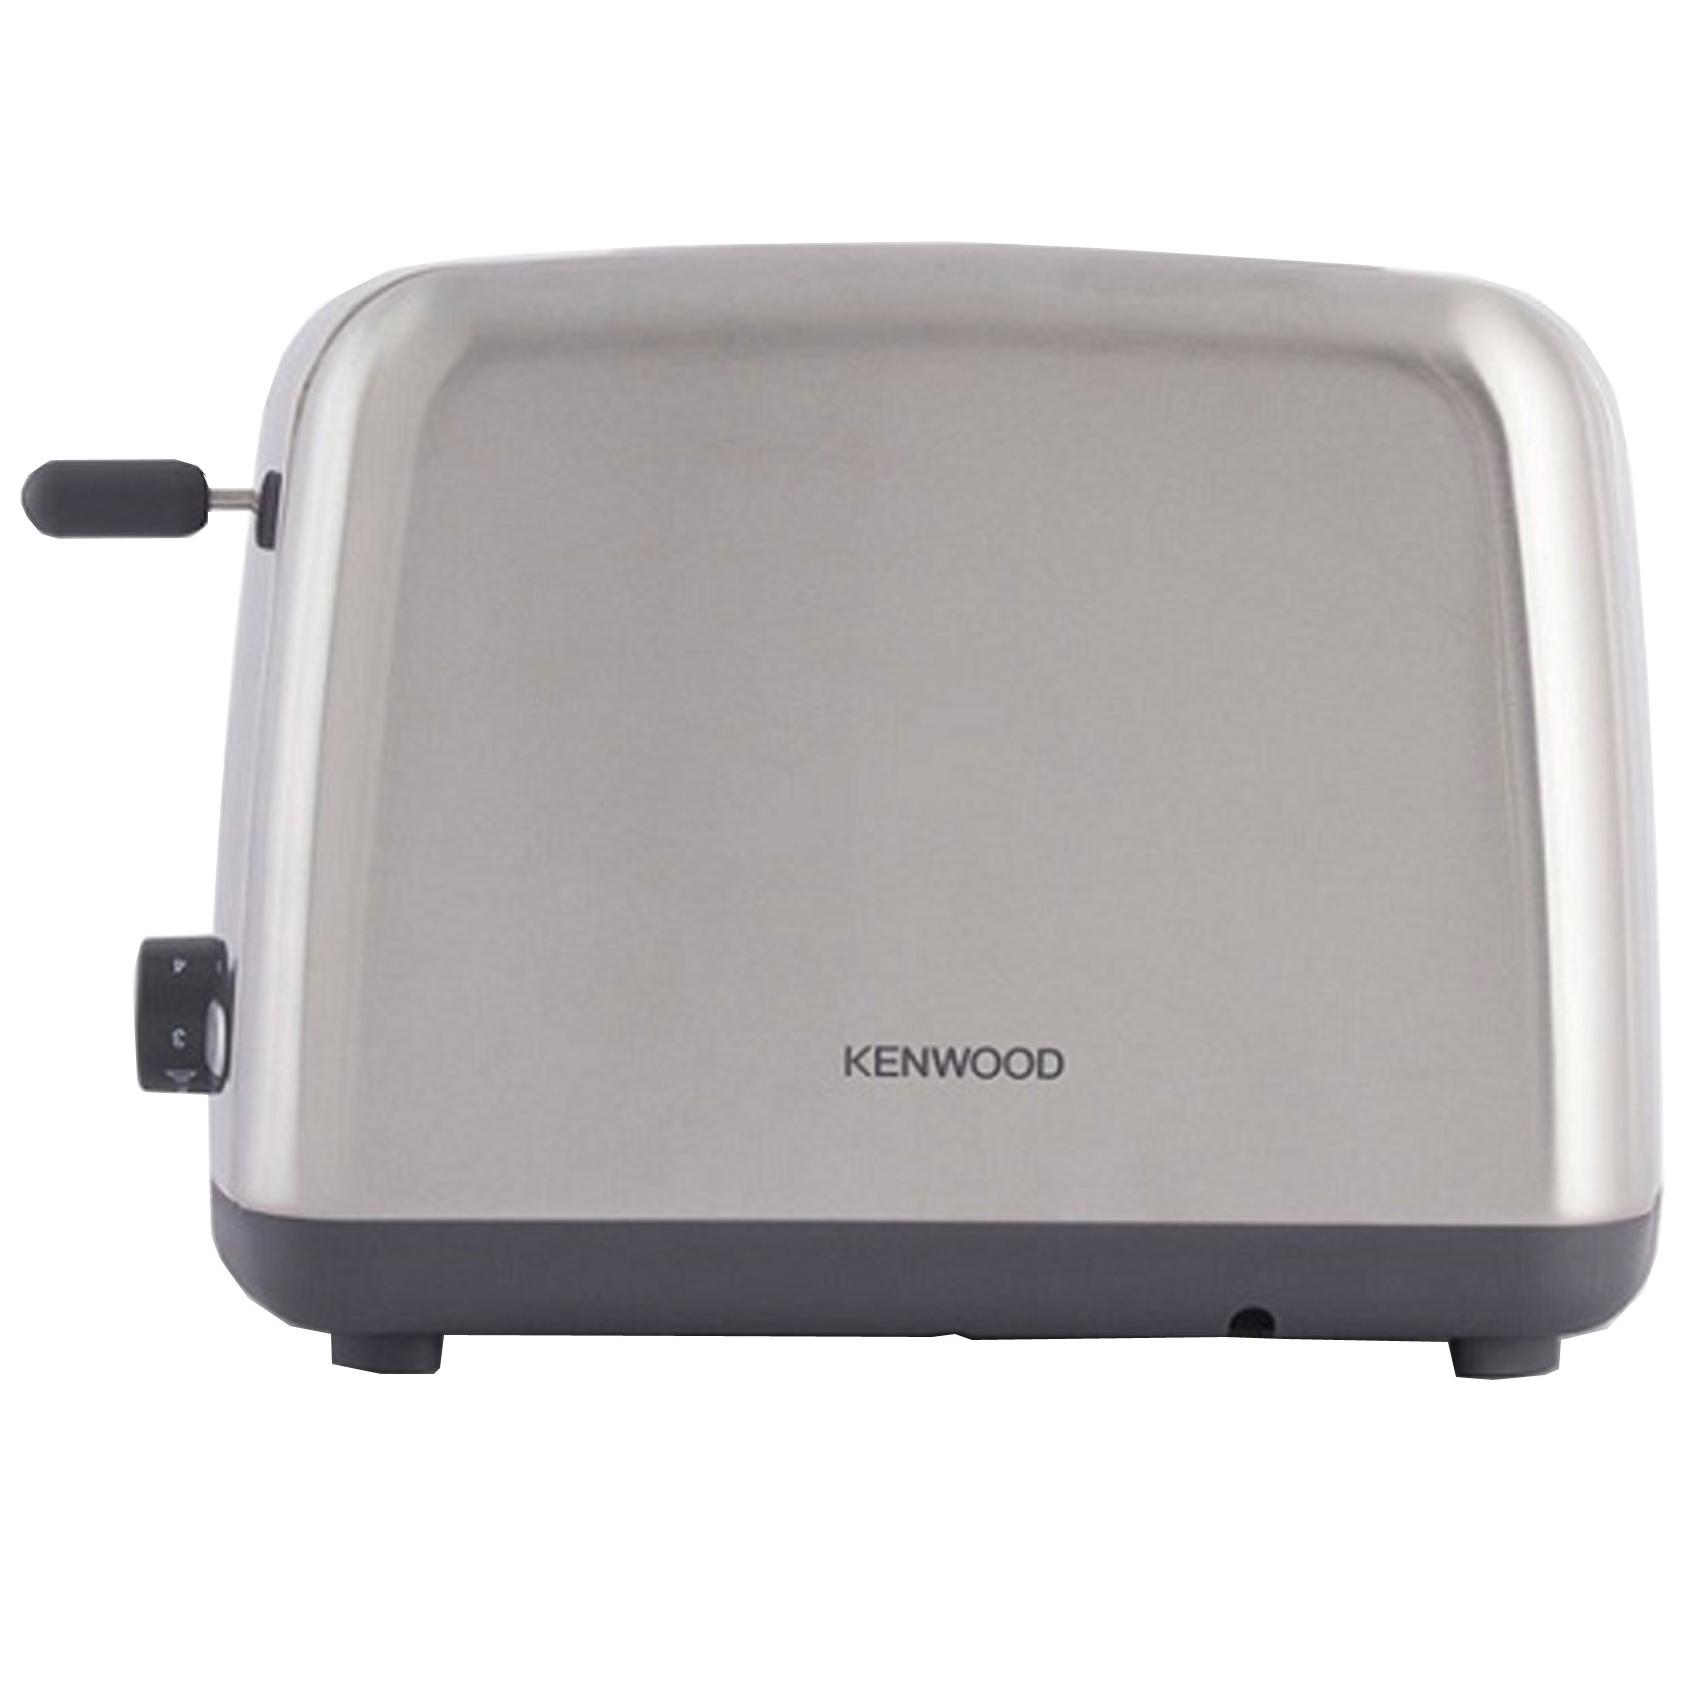 KENWOOD TOASTER TTM440